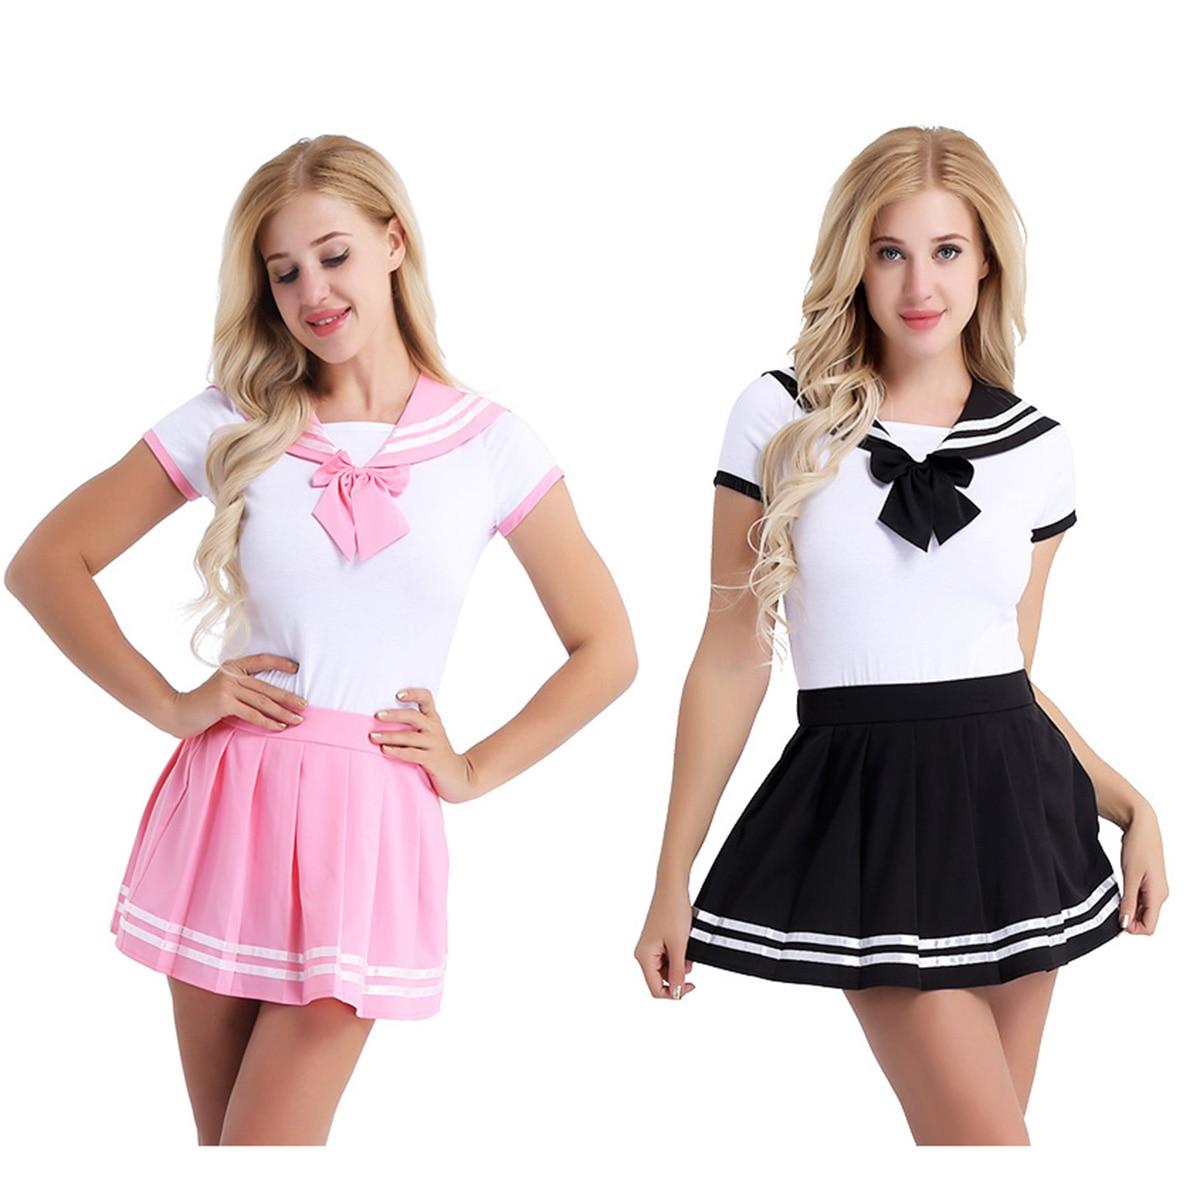 Image 2 - Iiniim feminino adulto roupas de bebê aberto virilha escola meninas sexy macacão com mini saia plissada cosplay trajes festa clubwearFantasias Sexy   -